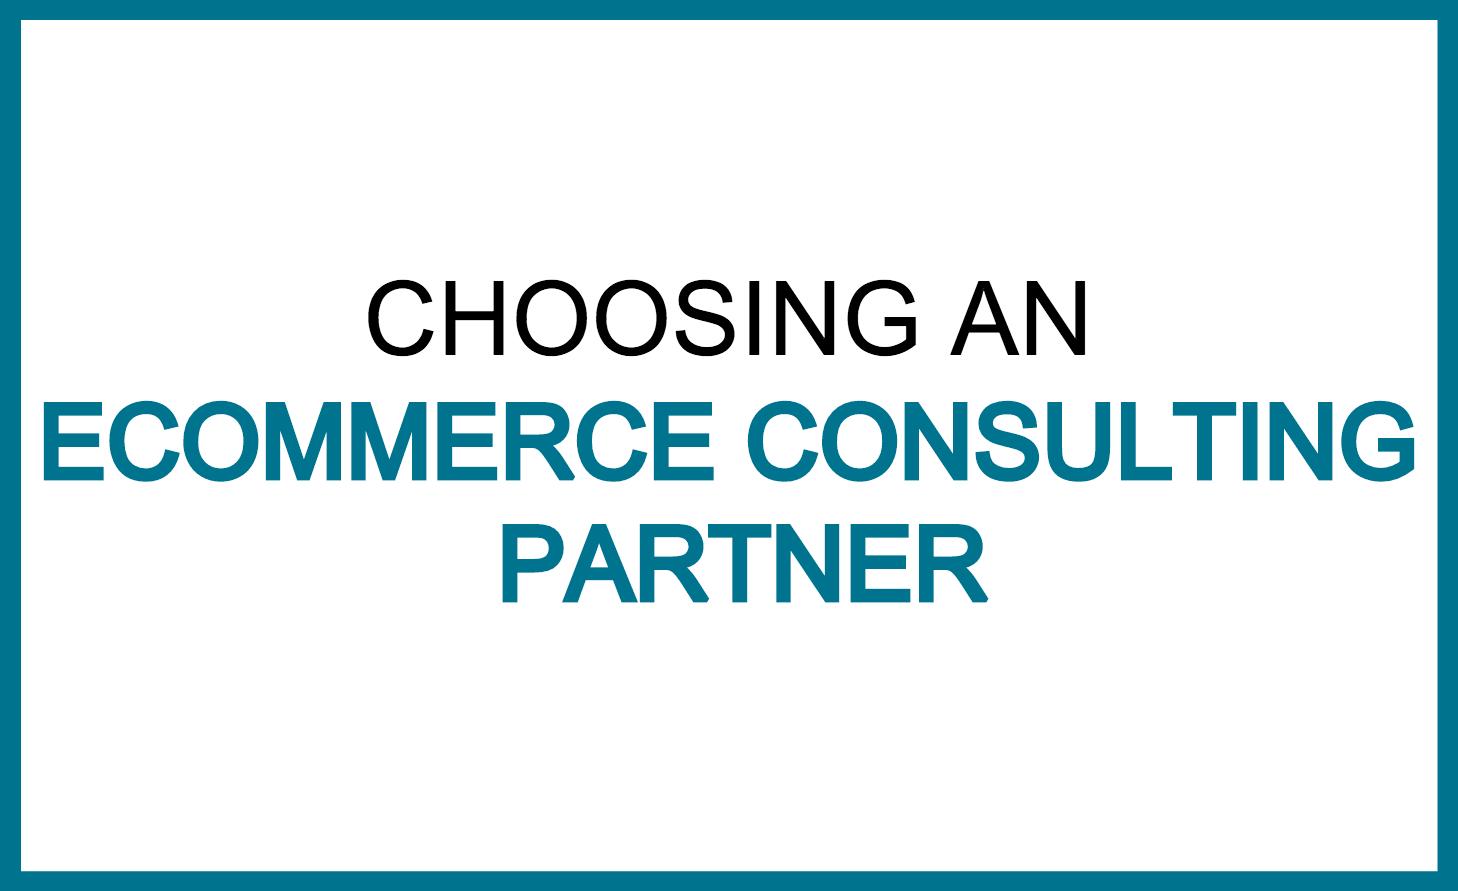 ecommerce partner